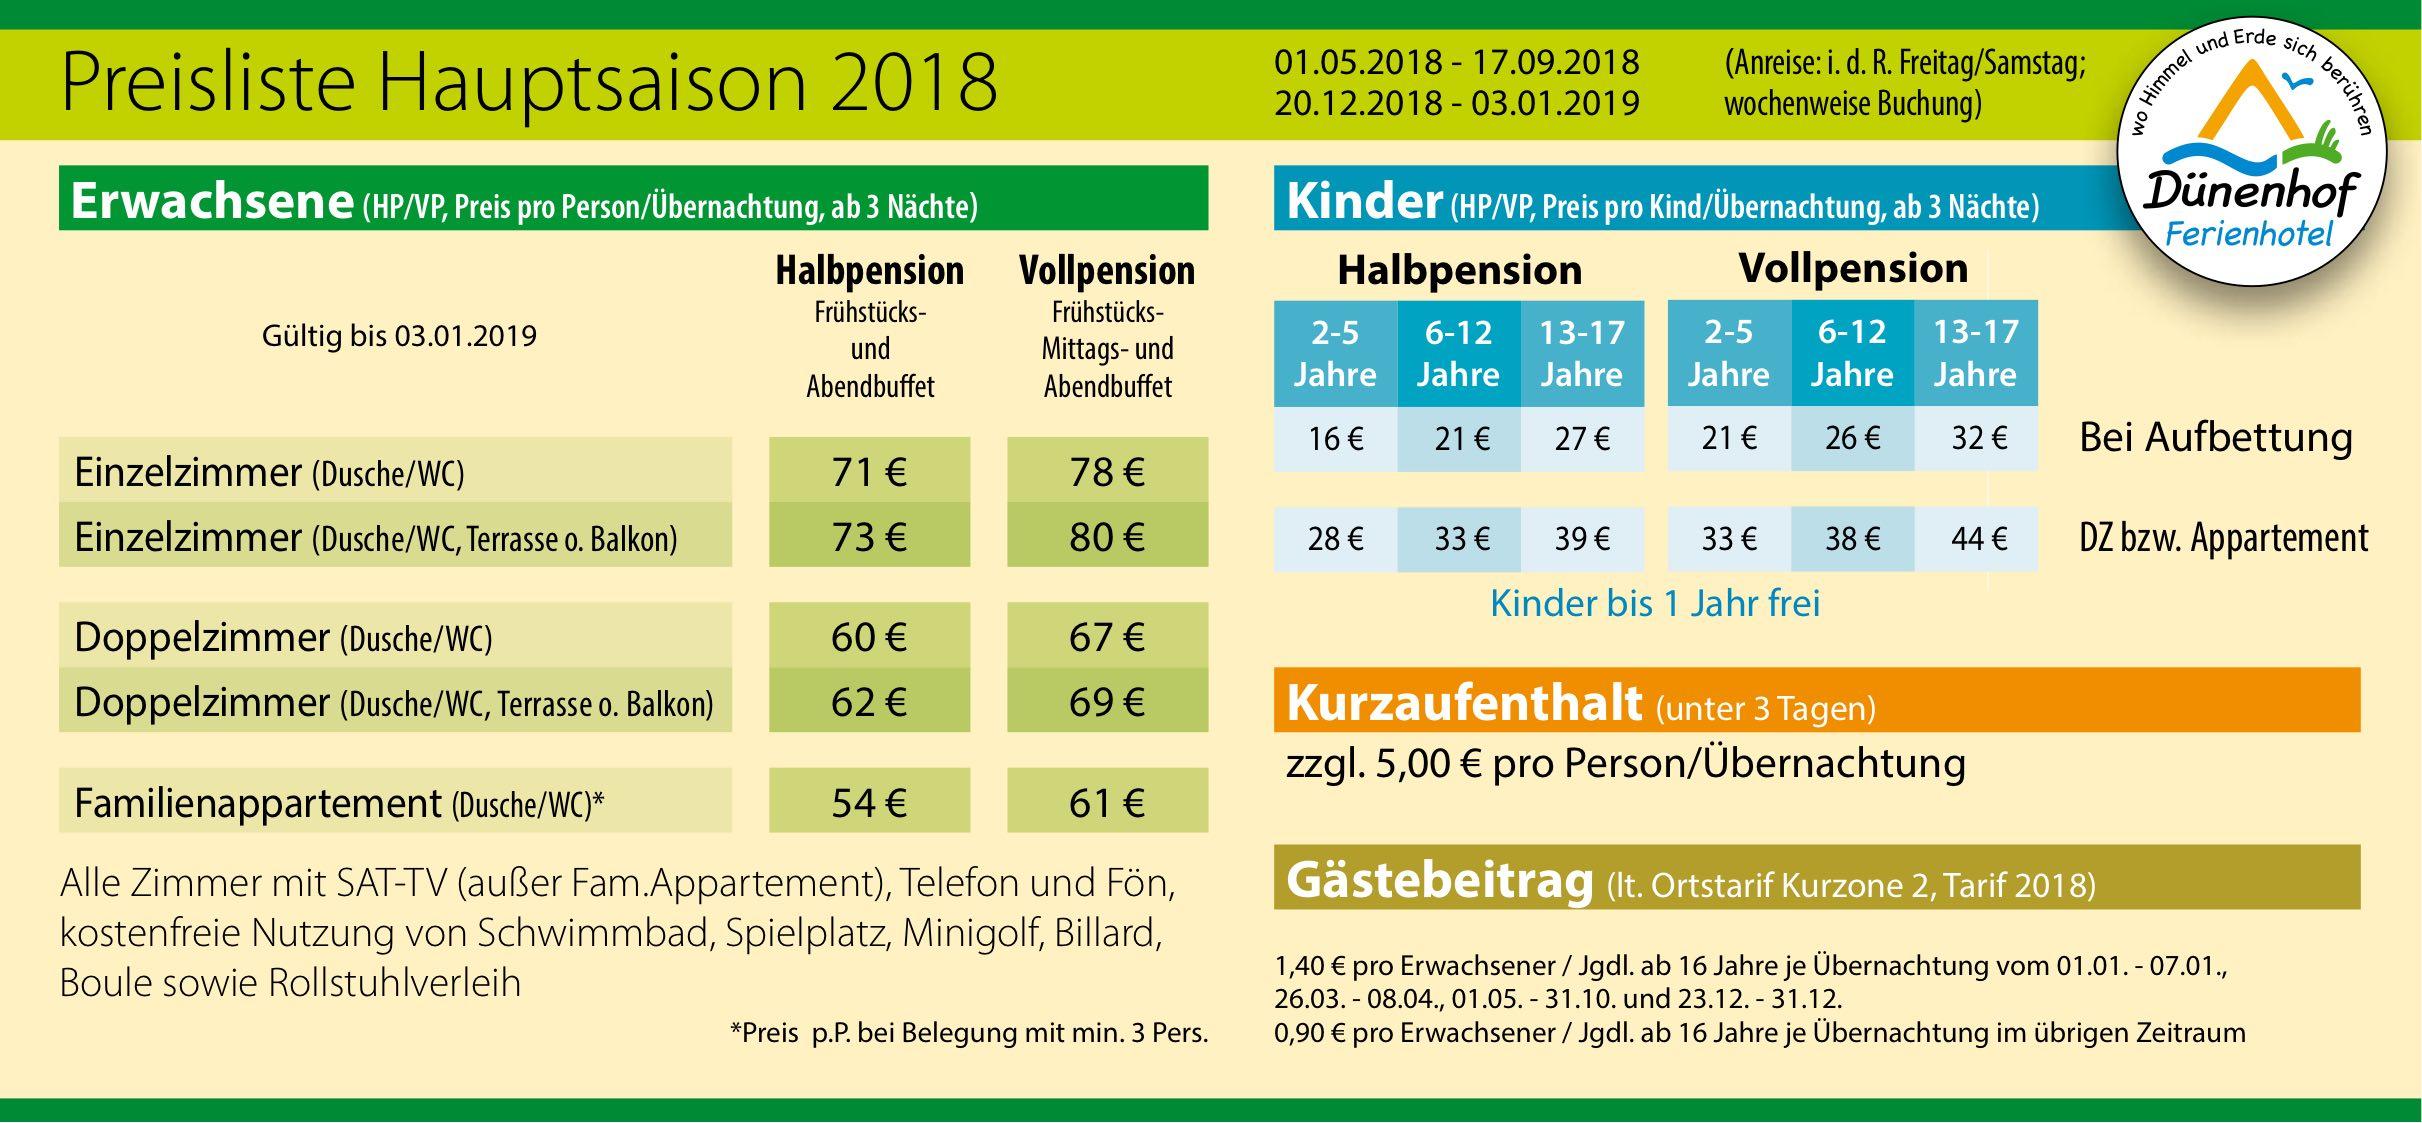 Hauptsaison Preise Dünenhof Ferienhotel